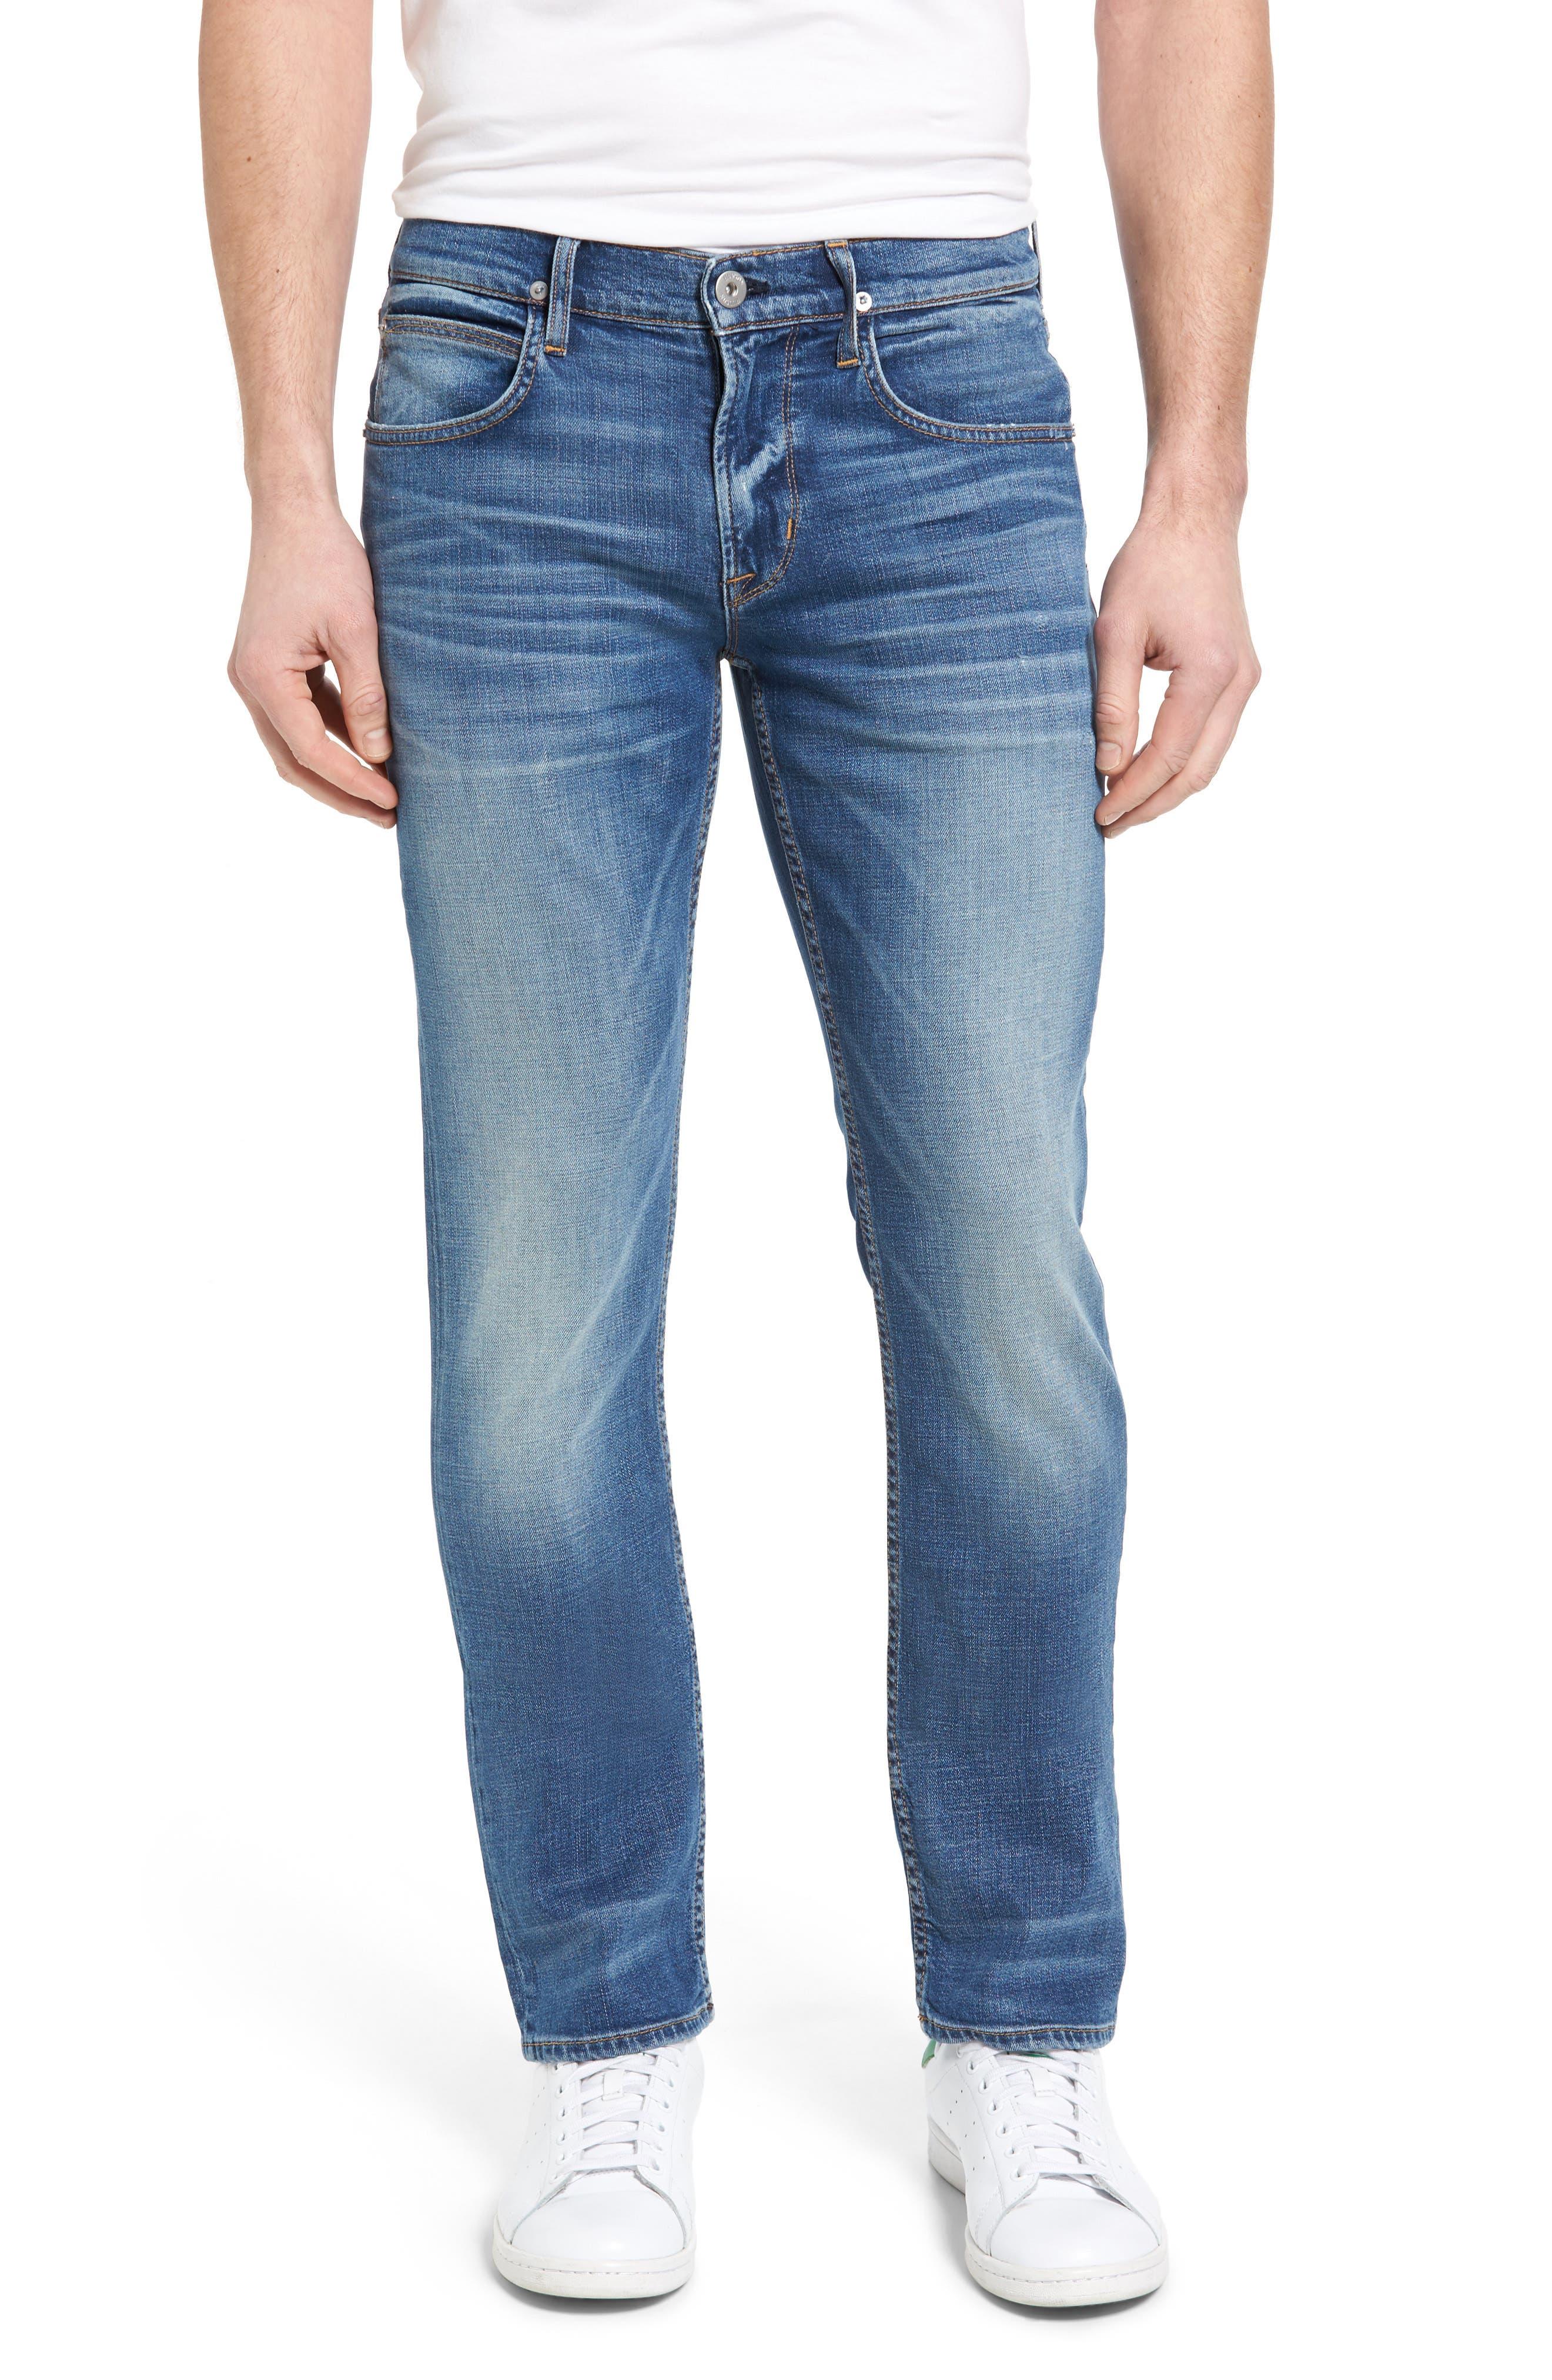 Byron Slim Straight Leg Jeans,                             Main thumbnail 1, color,                             453